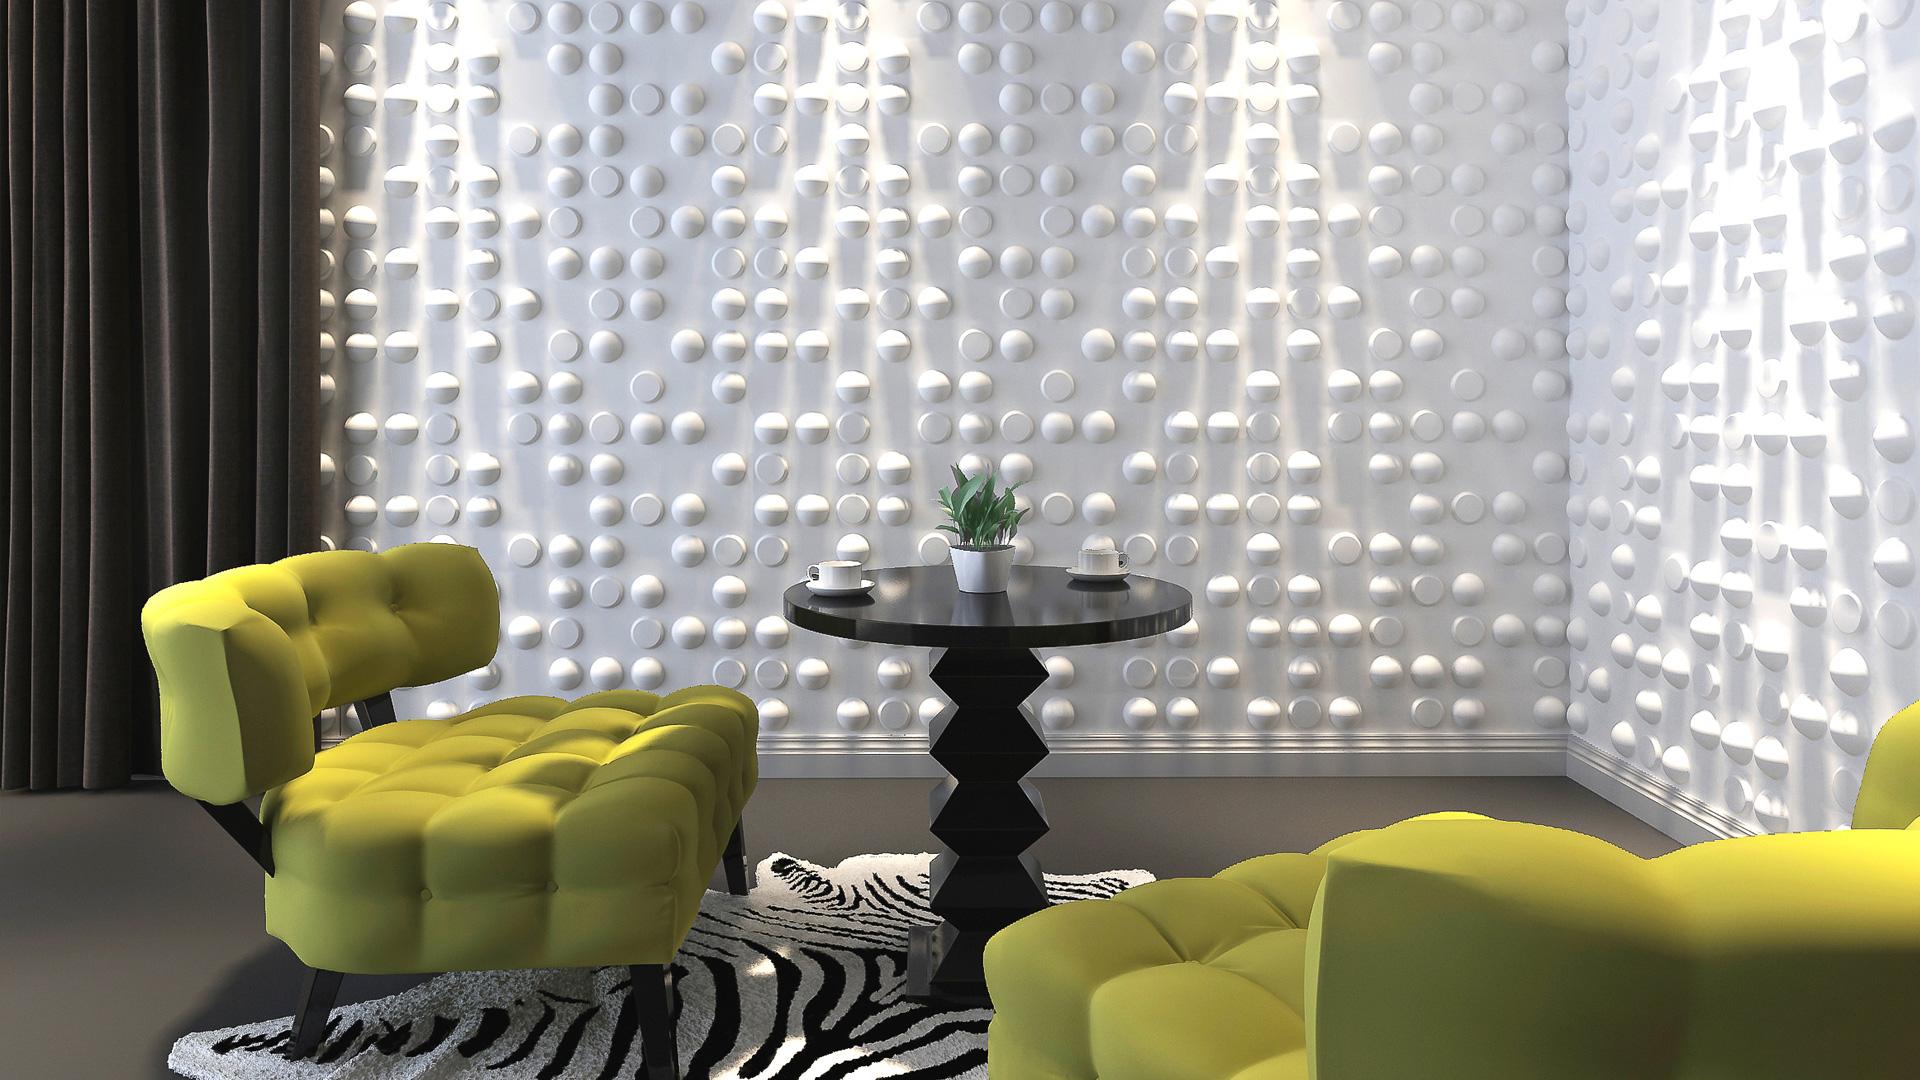 3D Wandpaneele - Produkte - Go - Deckenpaneele - 3D Tapeten - Wandverkleidung